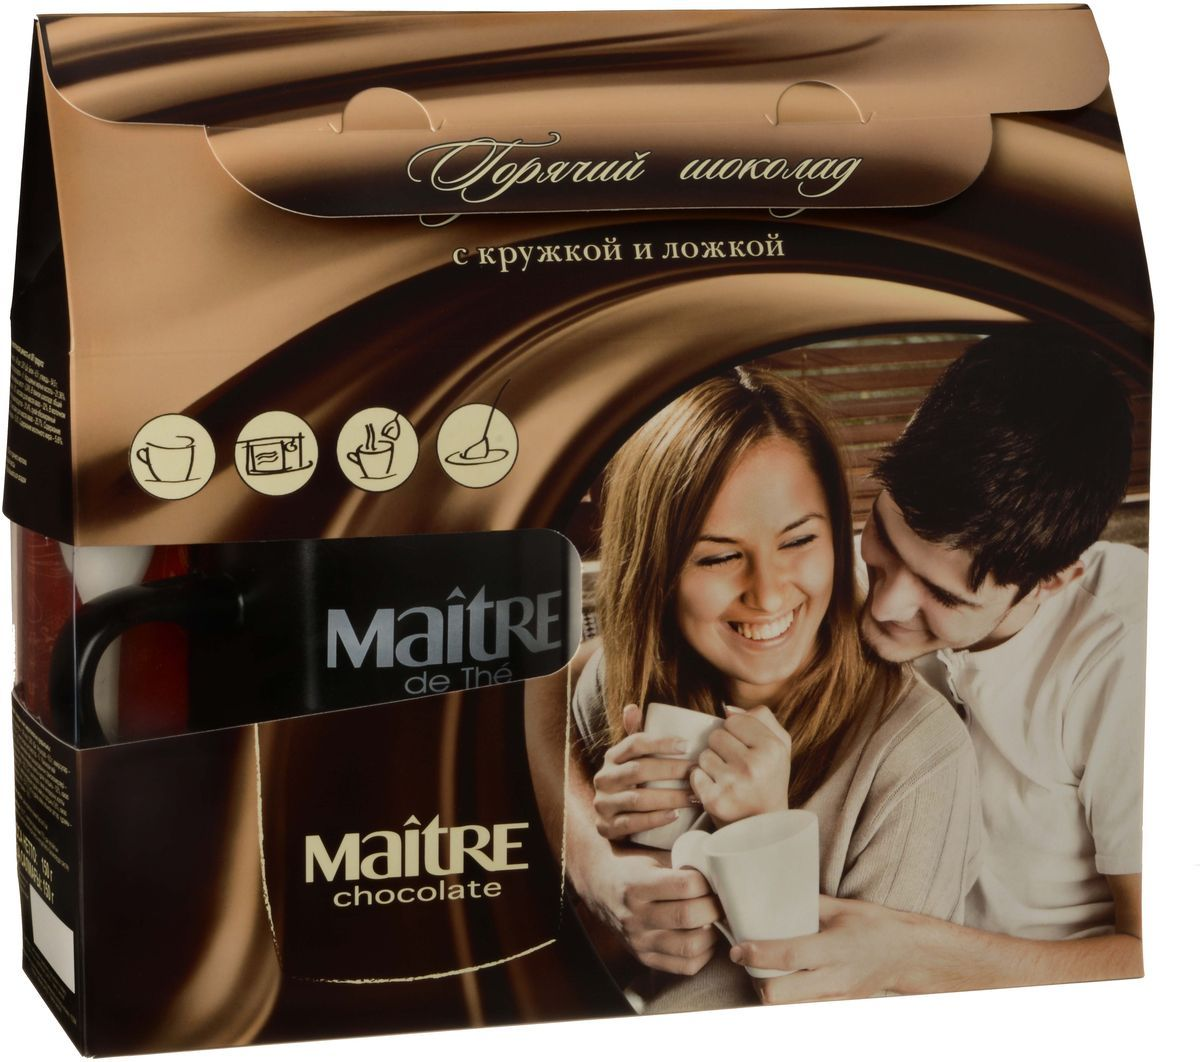 Maitre горячий шоколад, 150 г бабаевский элитный 75% какао темный шоколад 100 г